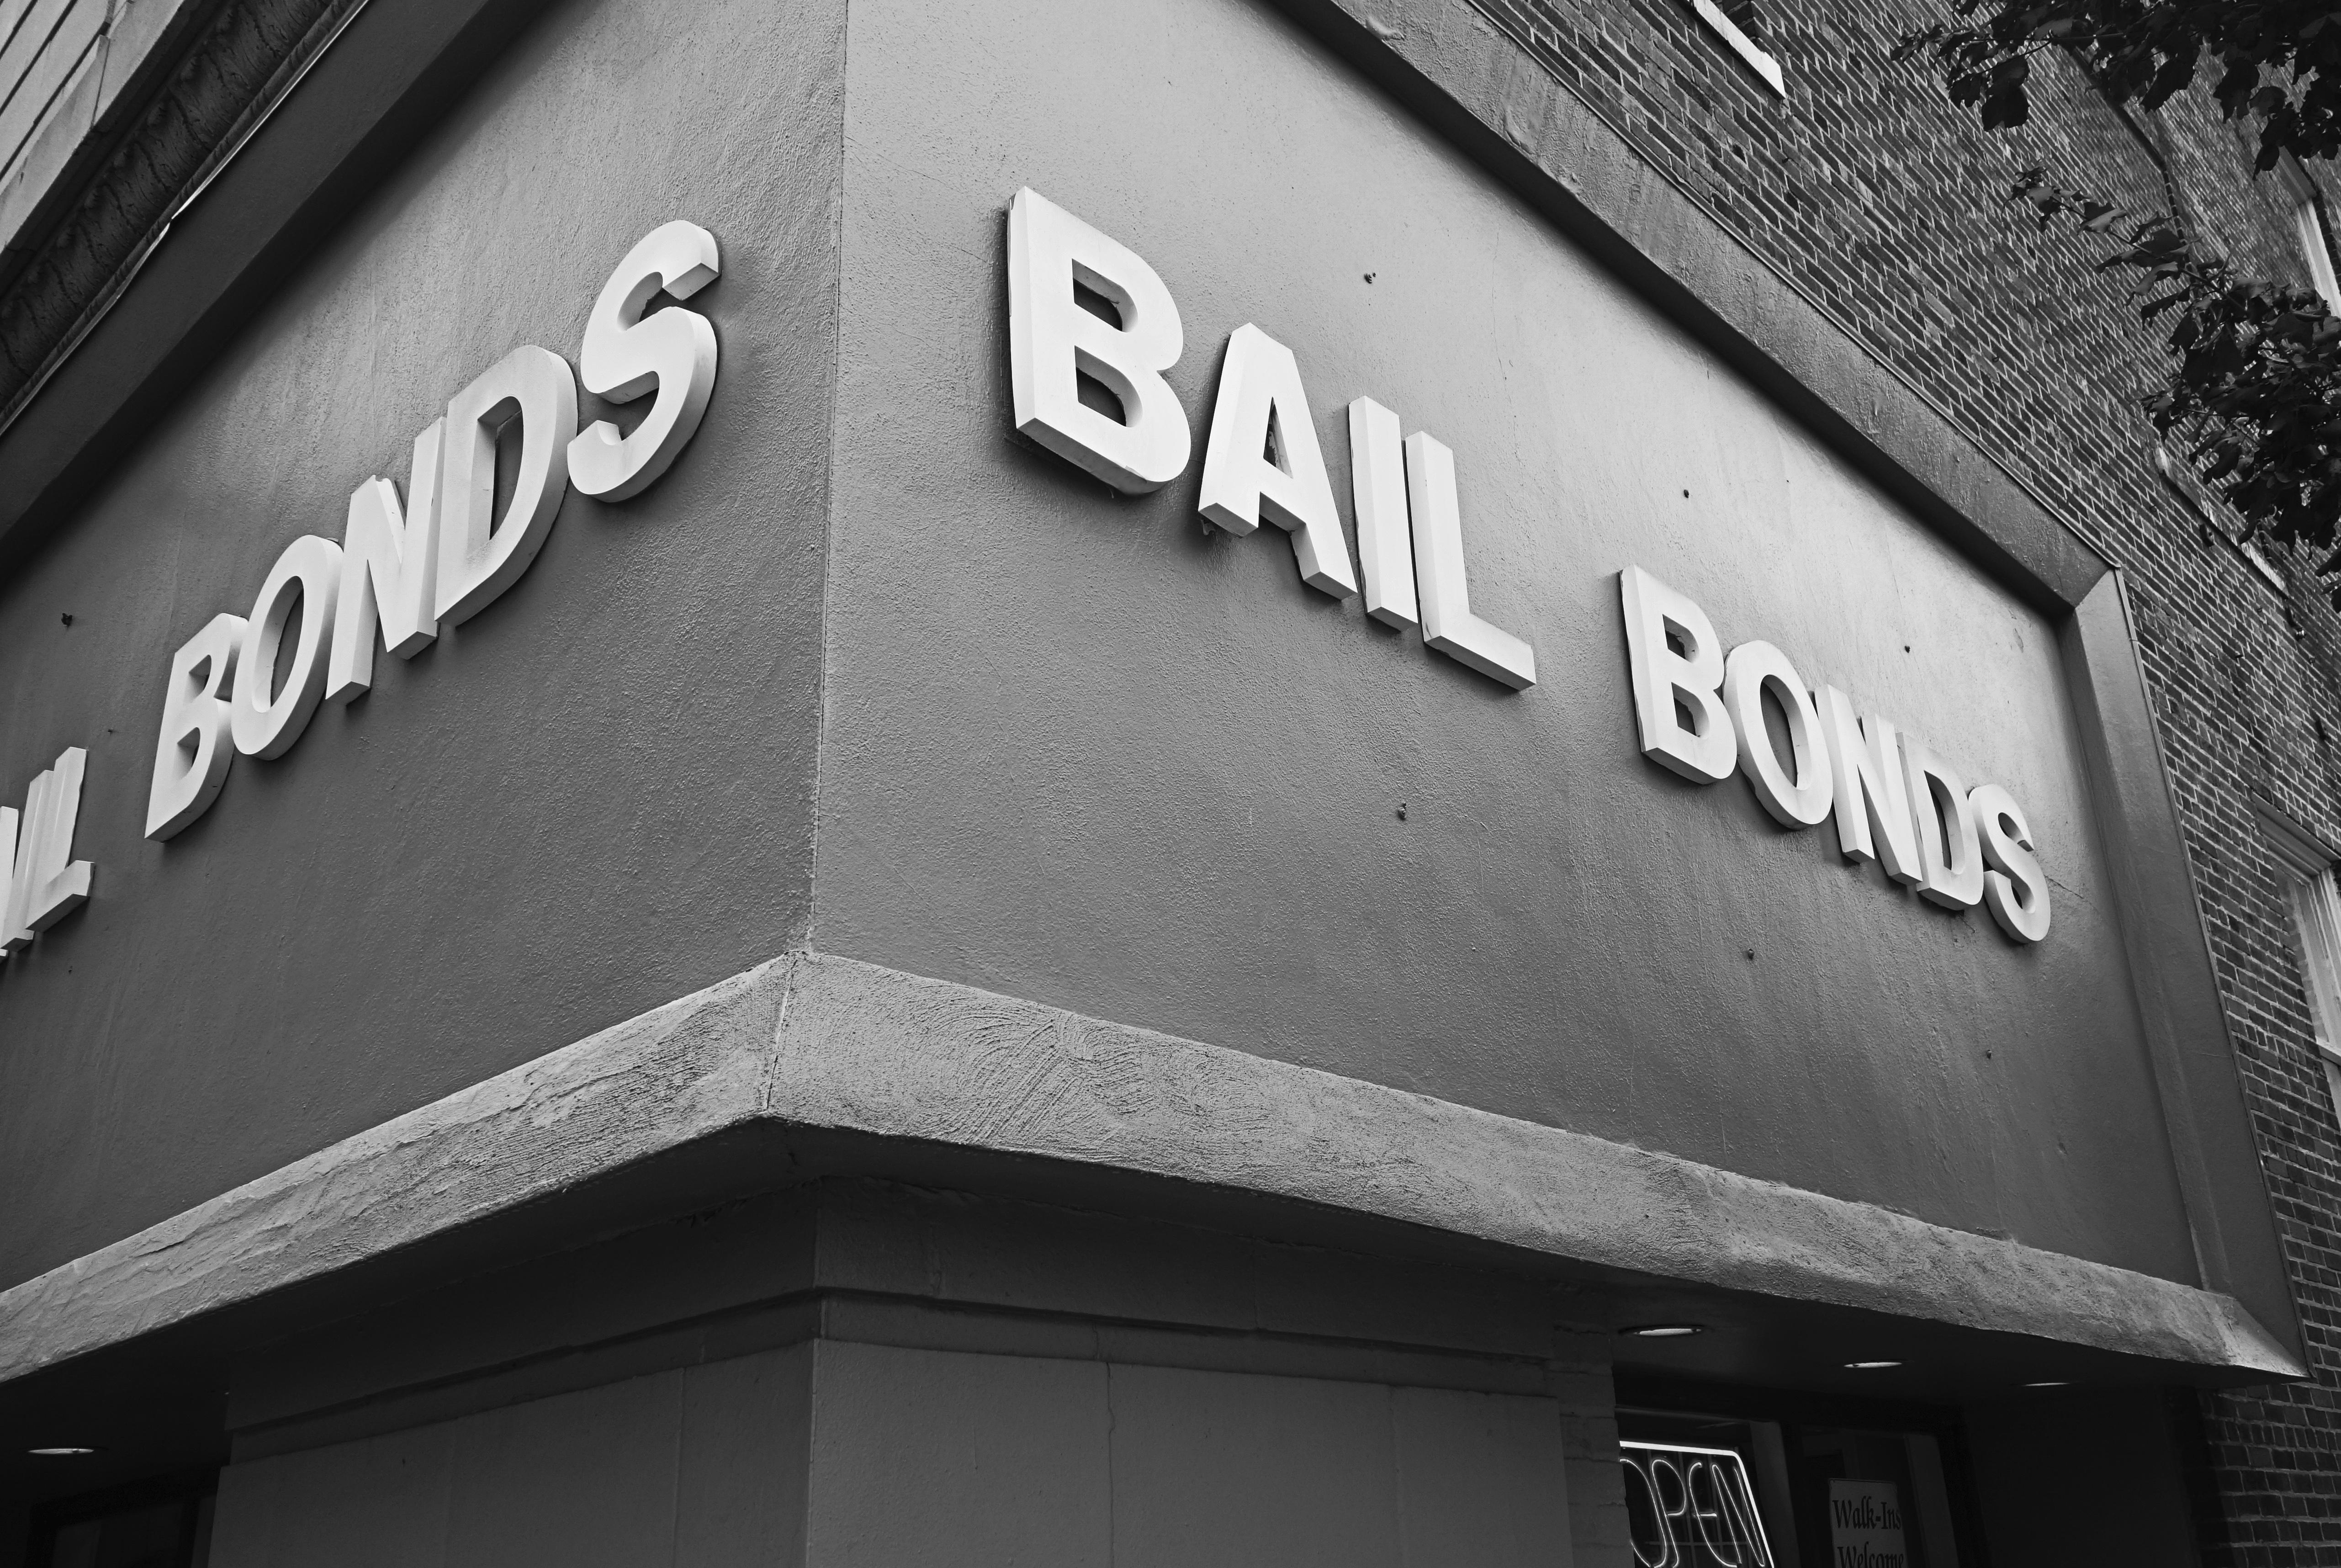 BailBondBuilding.jpg